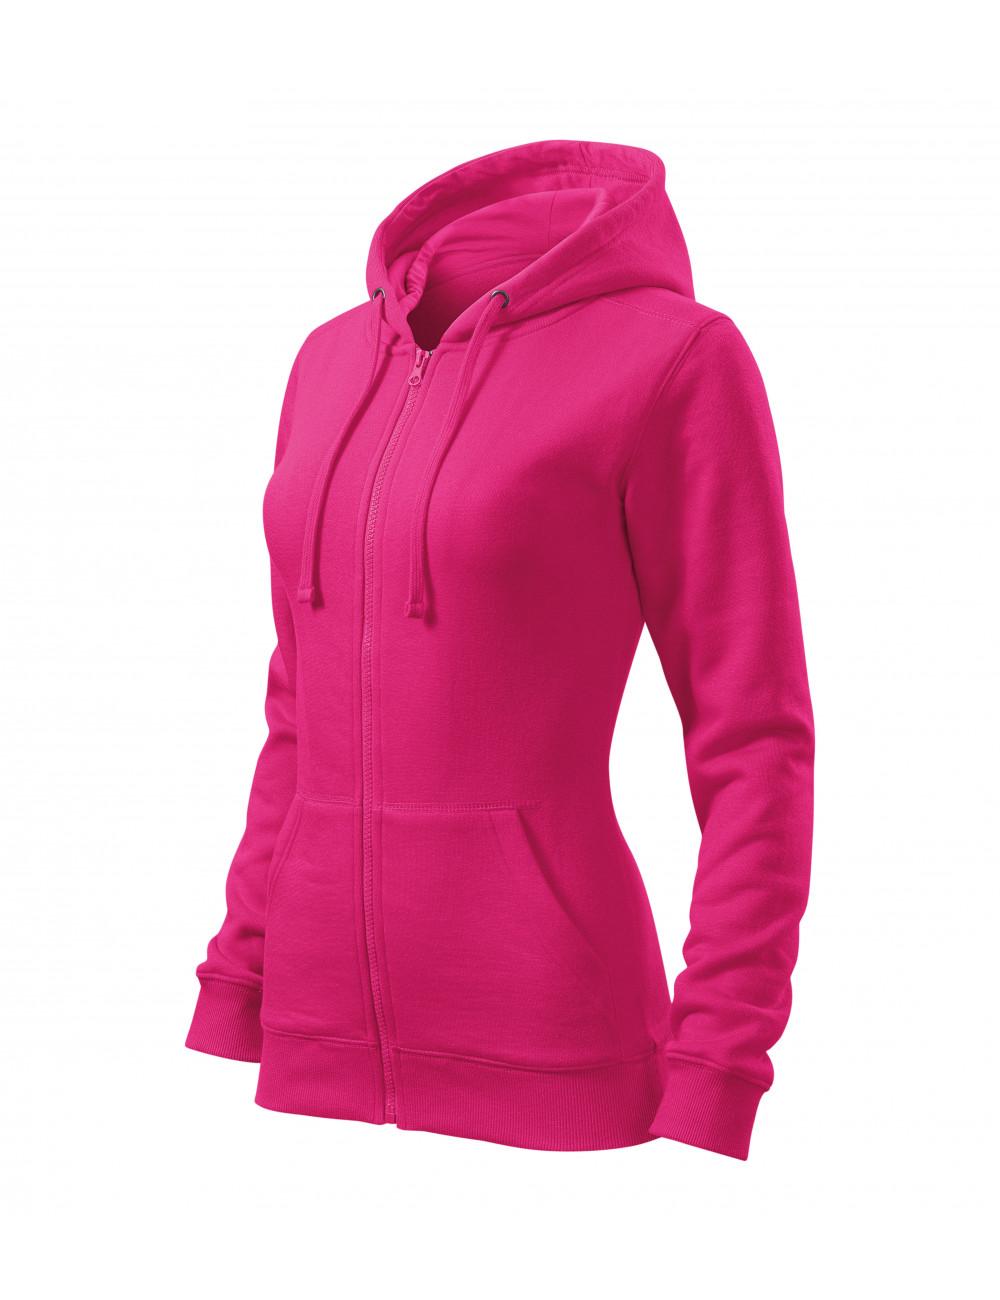 Adler MALFINI Bluza damska Trendy Zipper 411 czerwień purpurowa